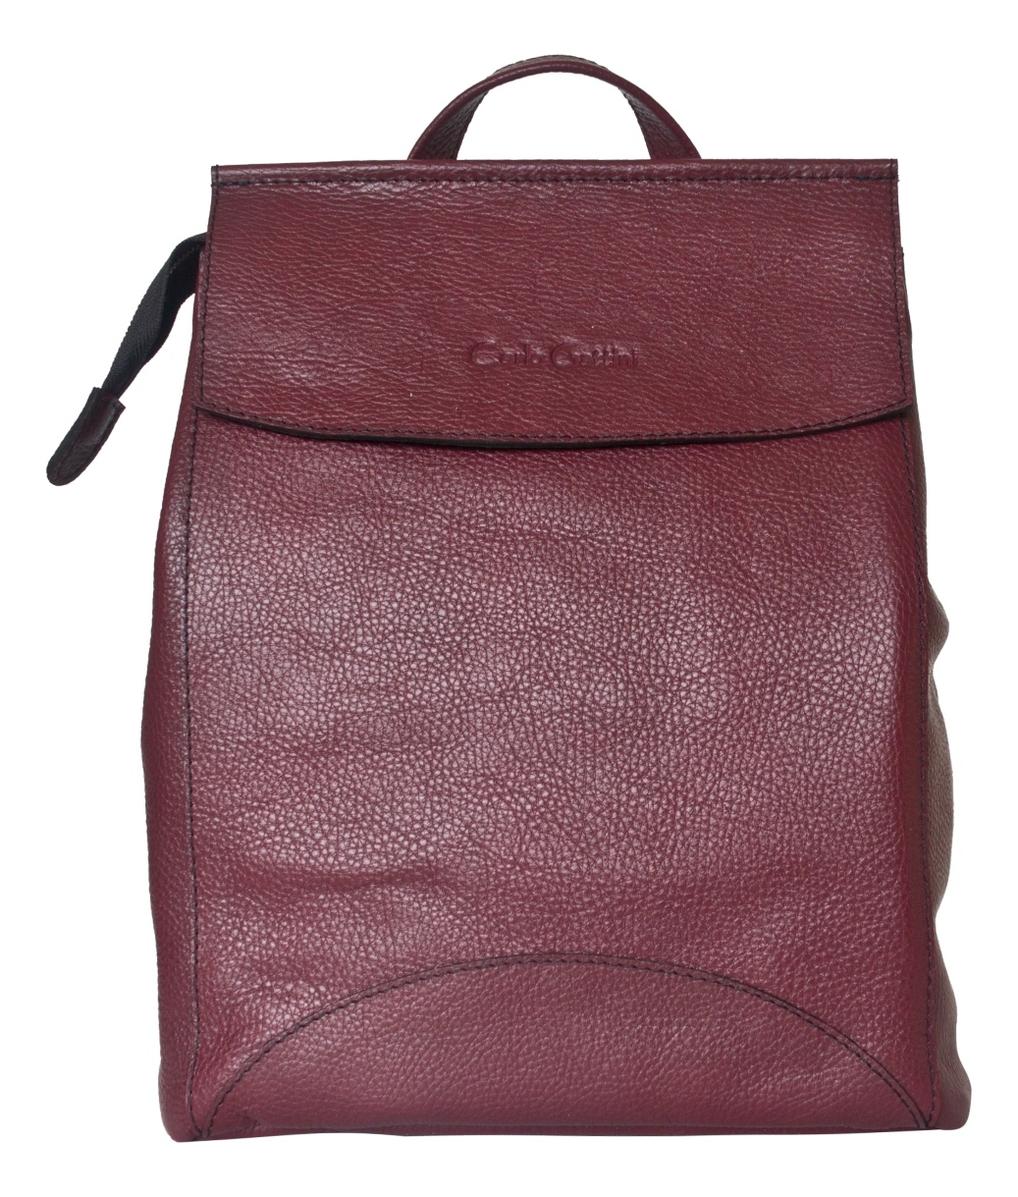 Сумка-рюкзак Antessio Bordo 3041-09 рюкзак gironacci 1272 nero fard bordo